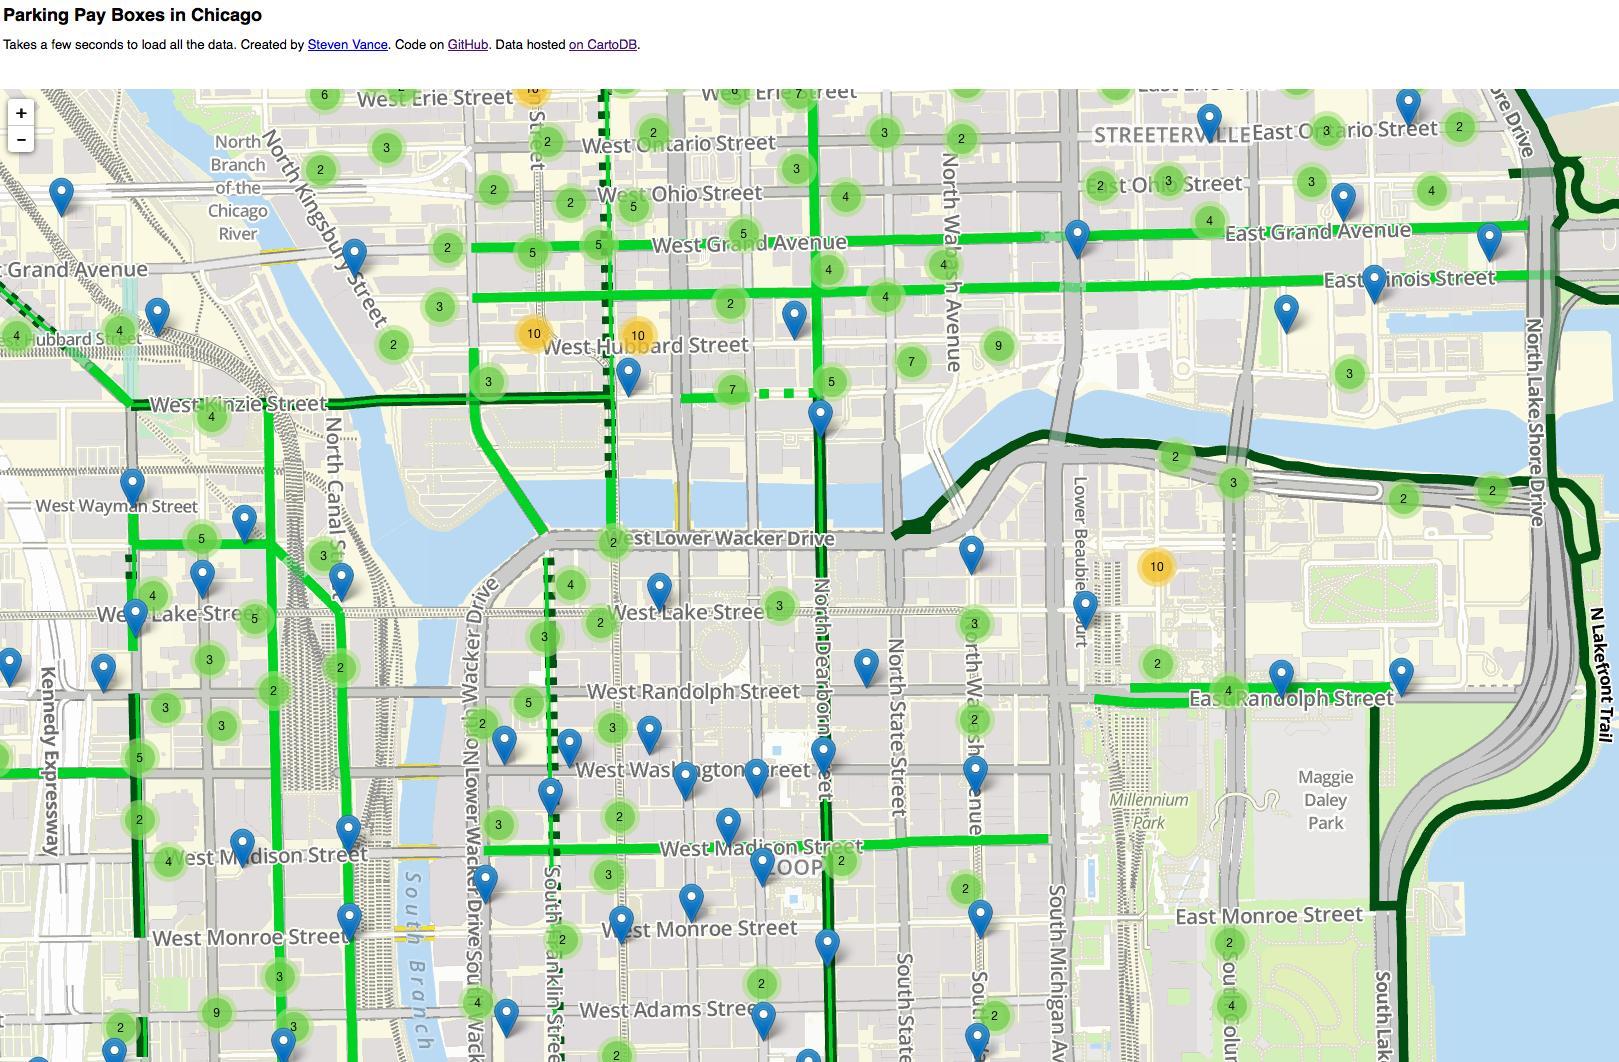 Chicago Parking Zone Map Chicago parking map   Chicago parking zone map (United States of